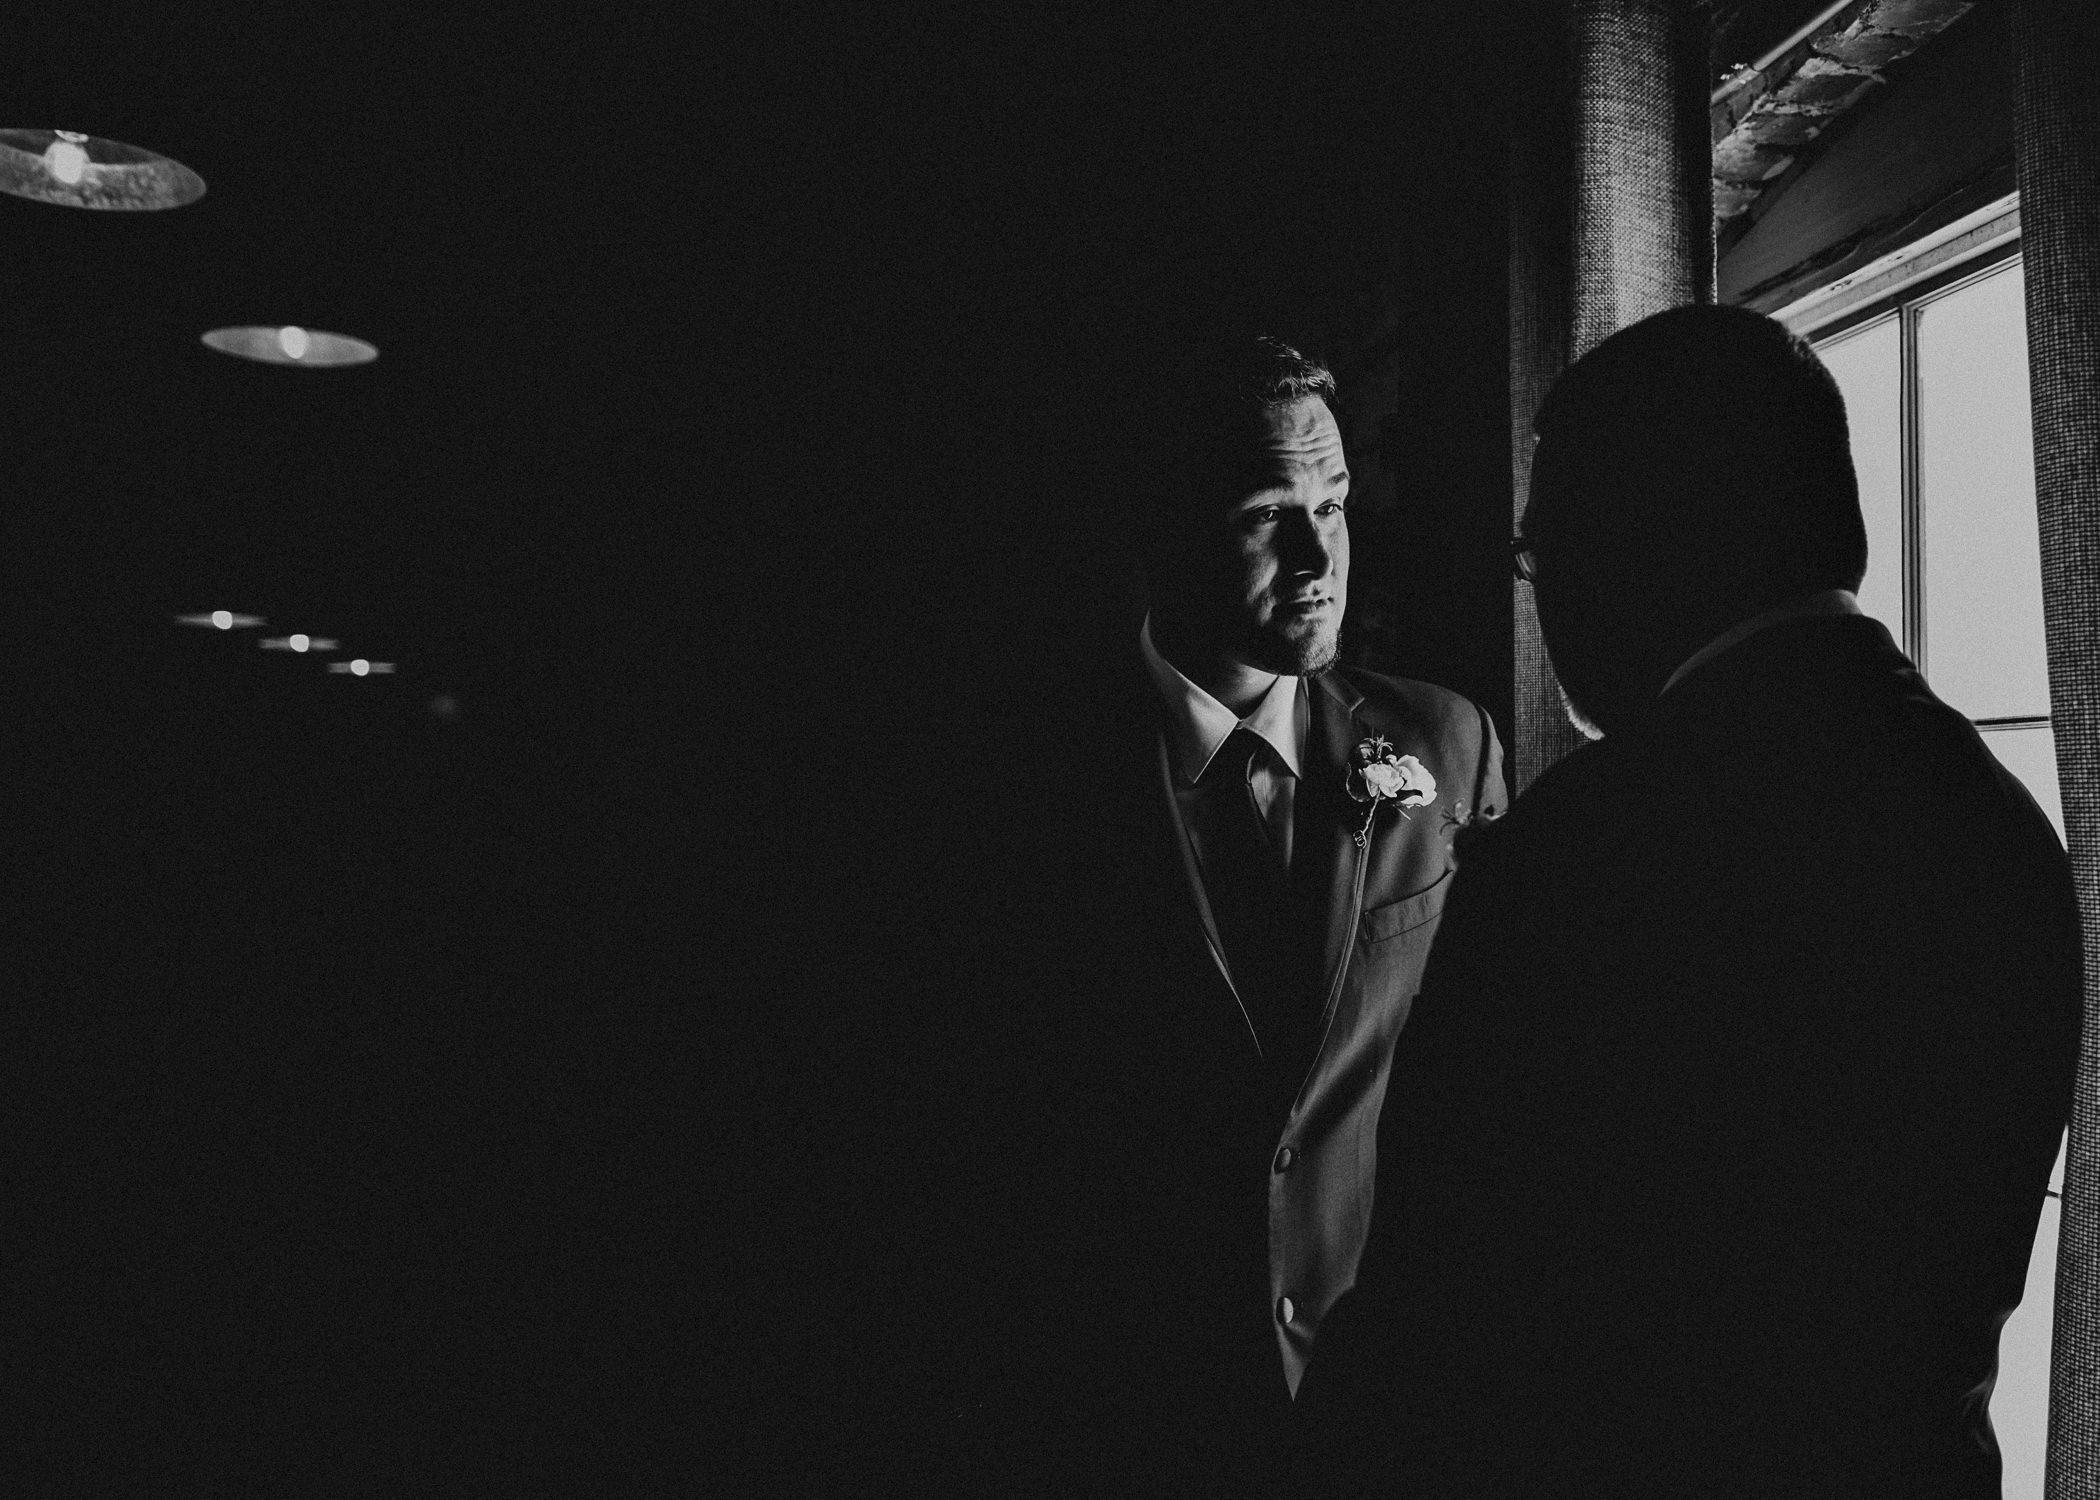 5 4 - Atlanta Wedding Photographer - The engine room - Ga - Wedding trends - Aline Marin Photography.jpg